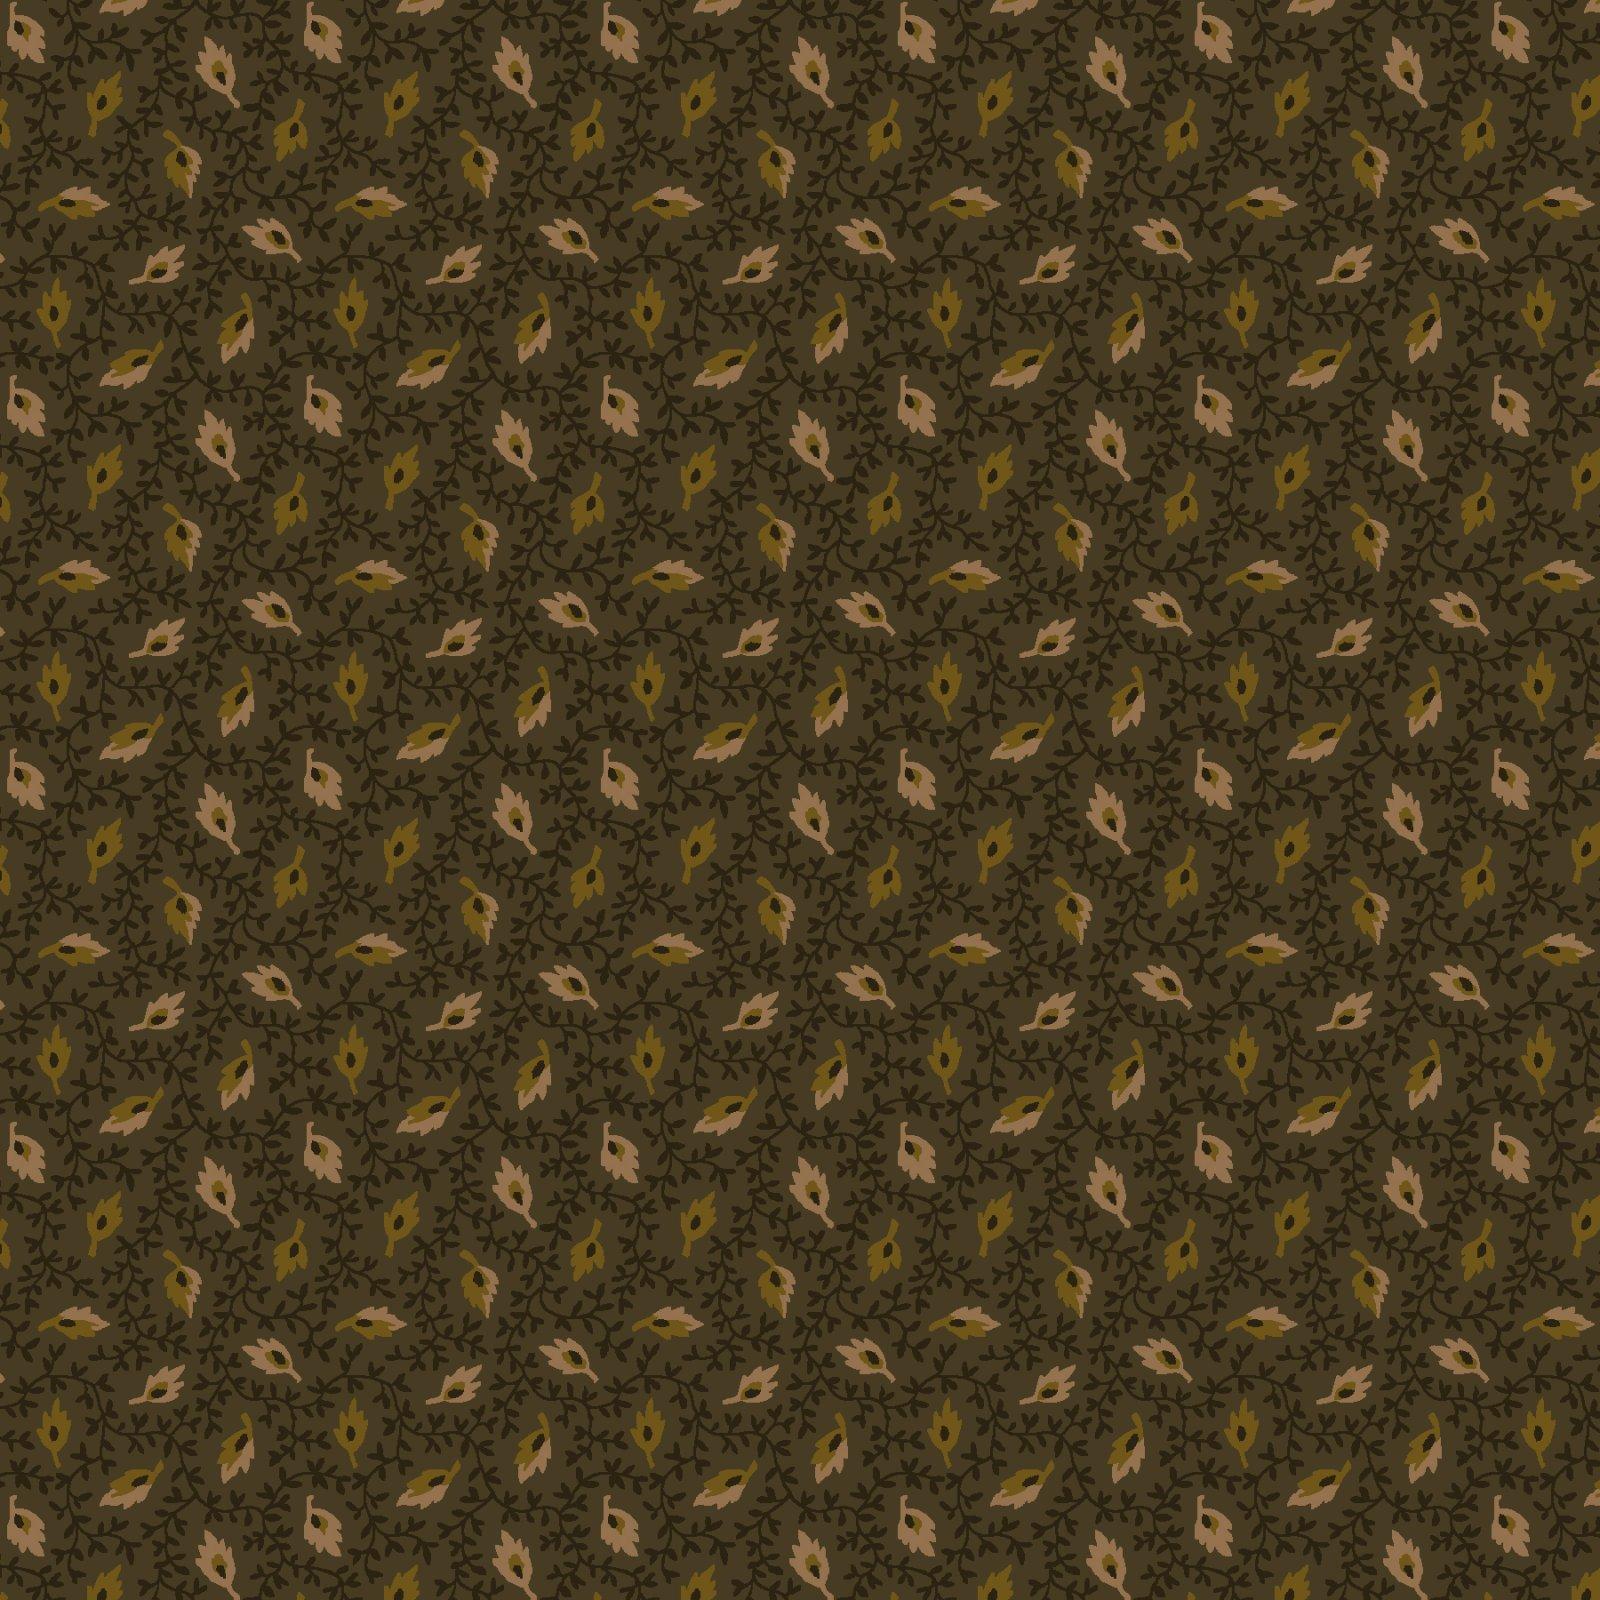 Buttermilk Autumn - 2279-66 * 1/2 yard